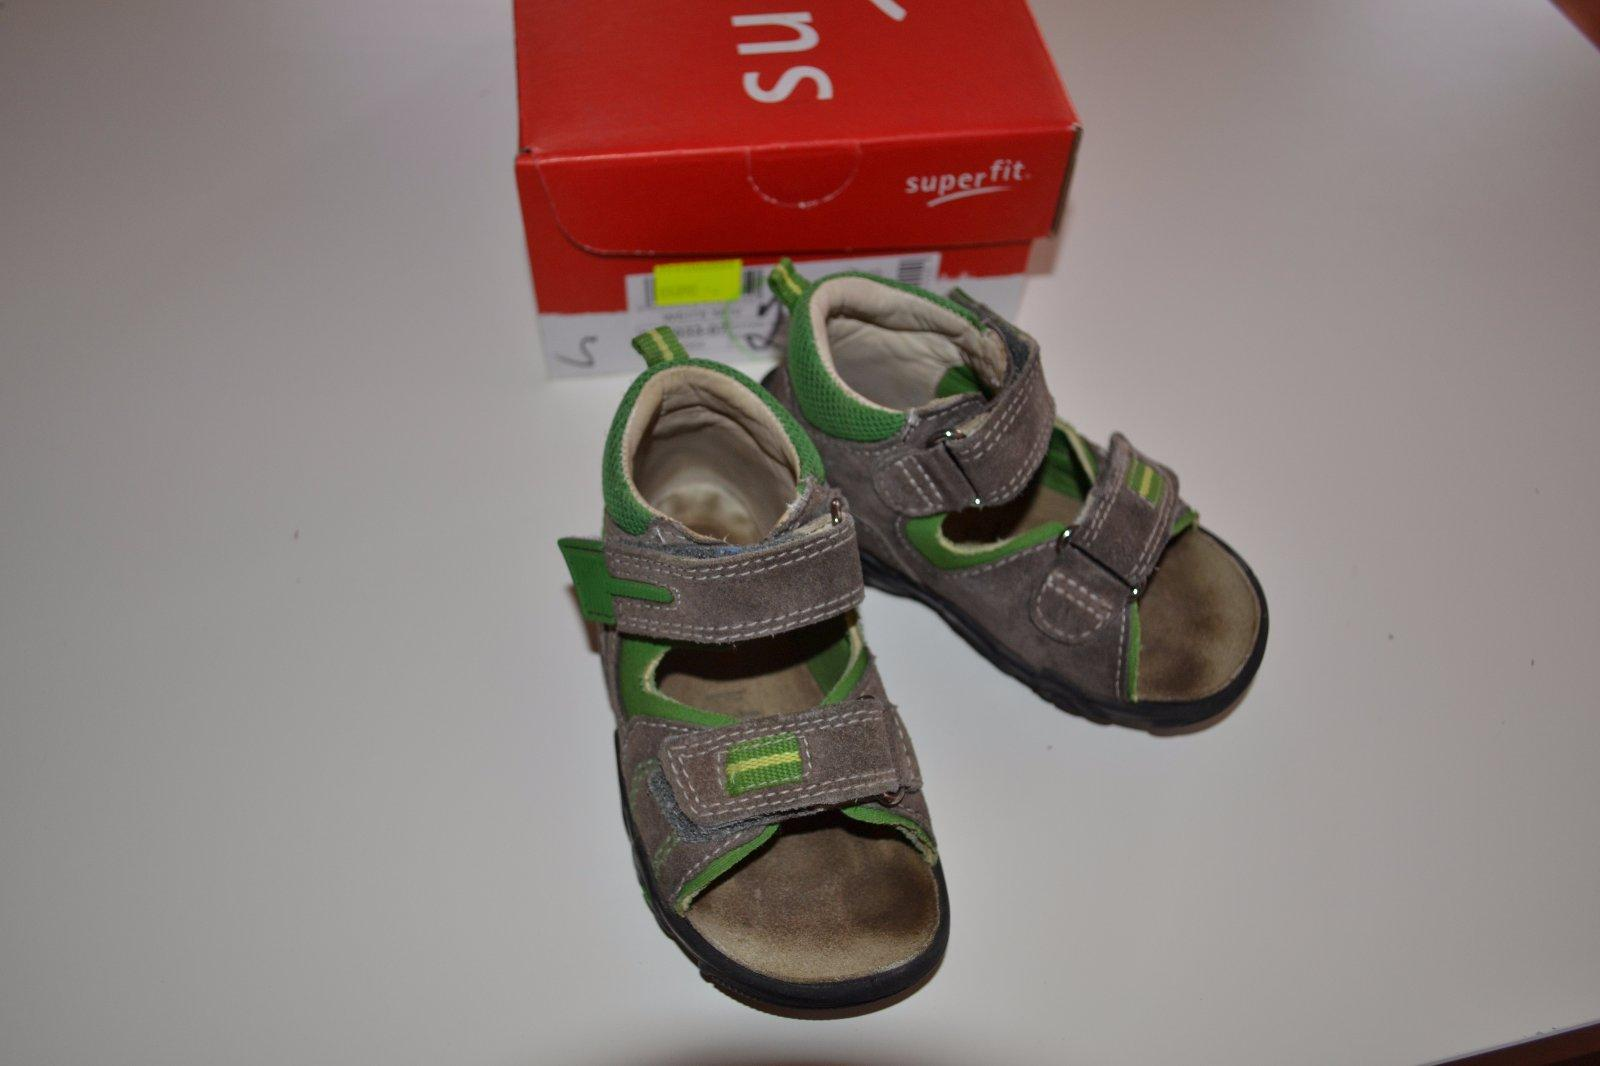 f12ea561ad3 Superfit zdravotní sandálky vel.22